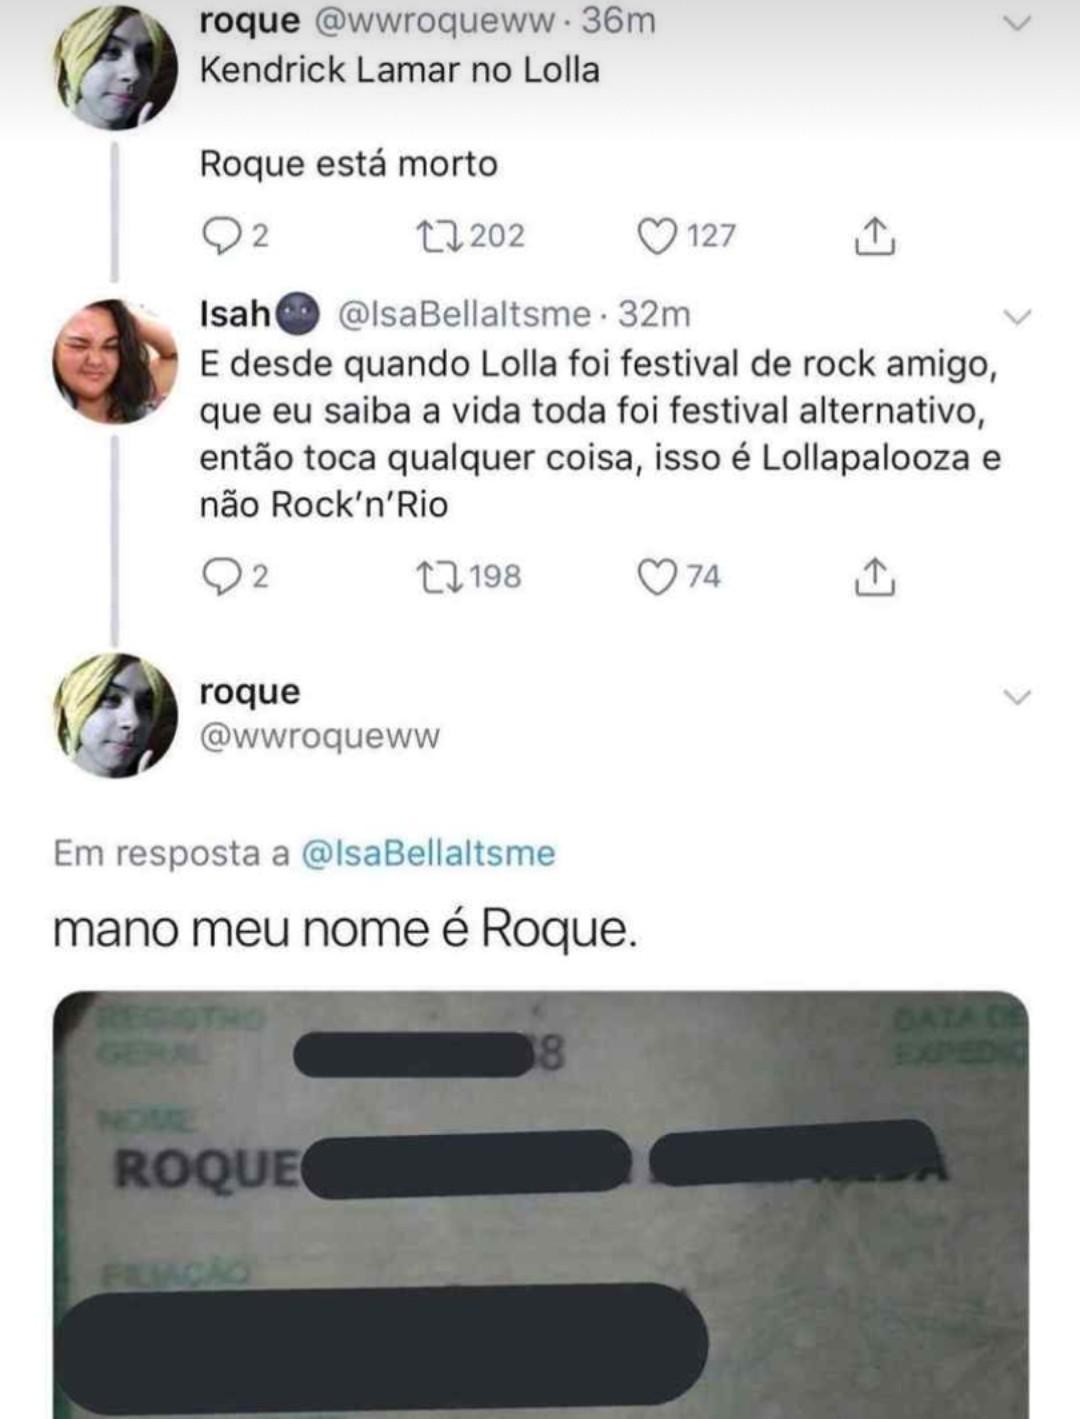 R.I.P roque - meme